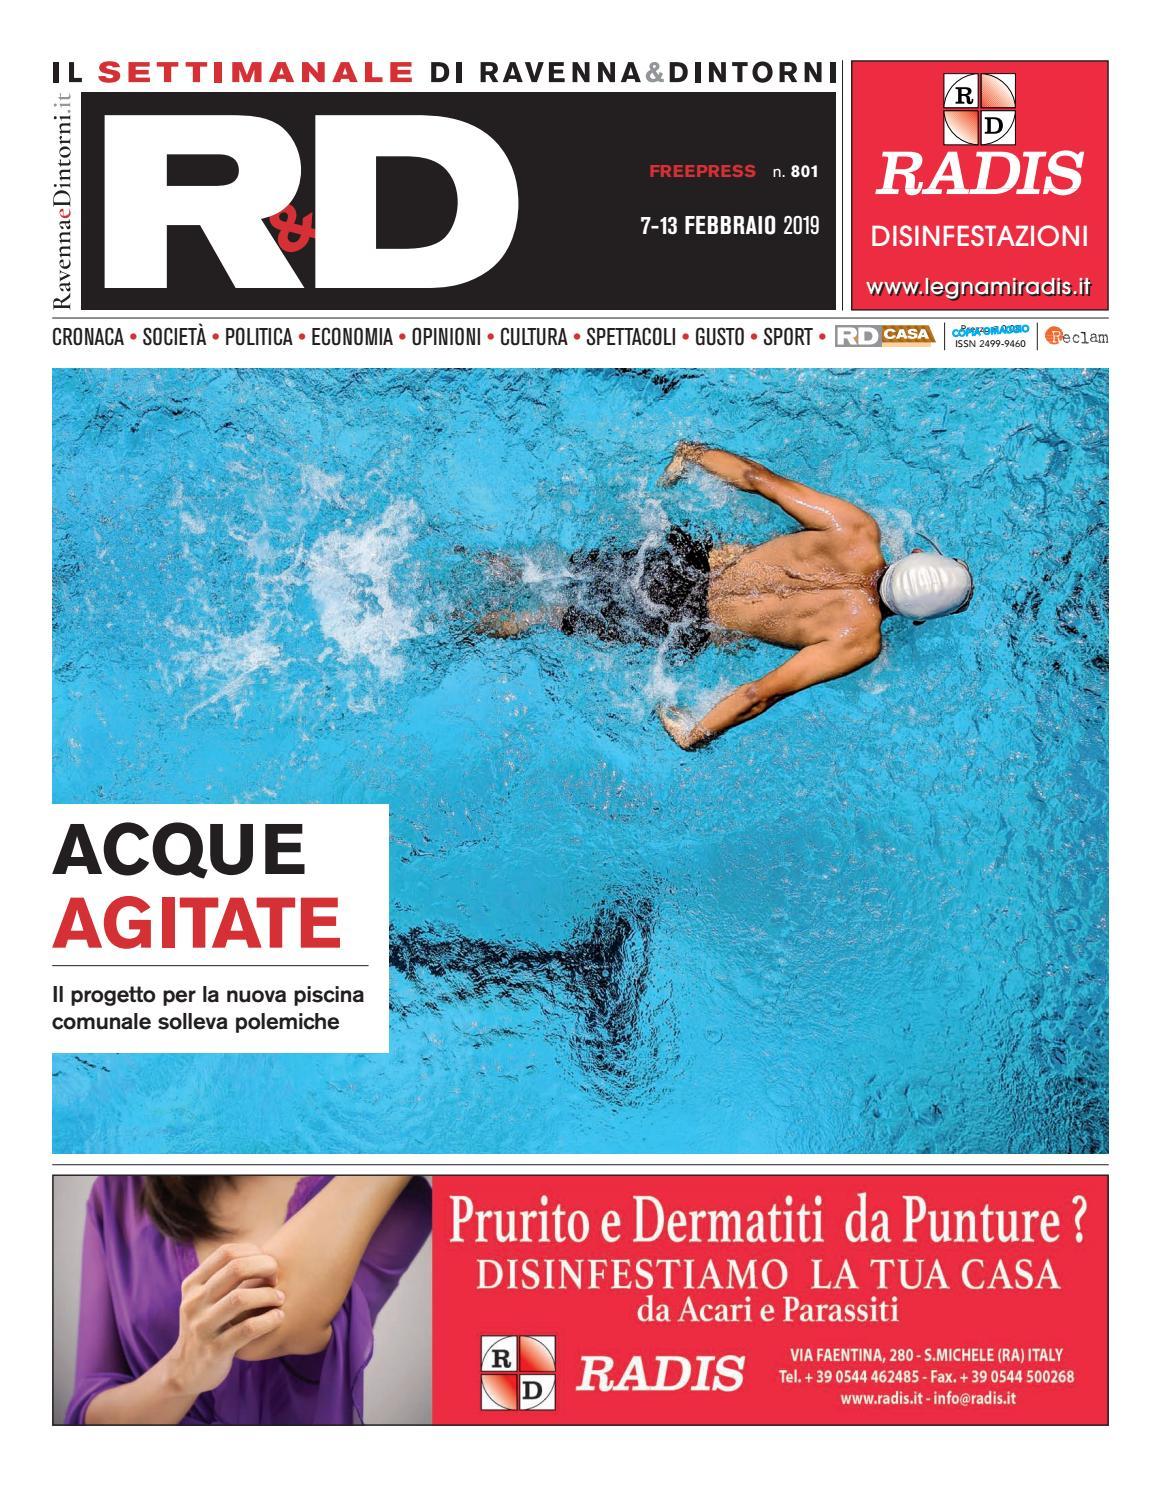 R&D 07 02 2019 by Reclam Edizioni e Comunicazione - issuu